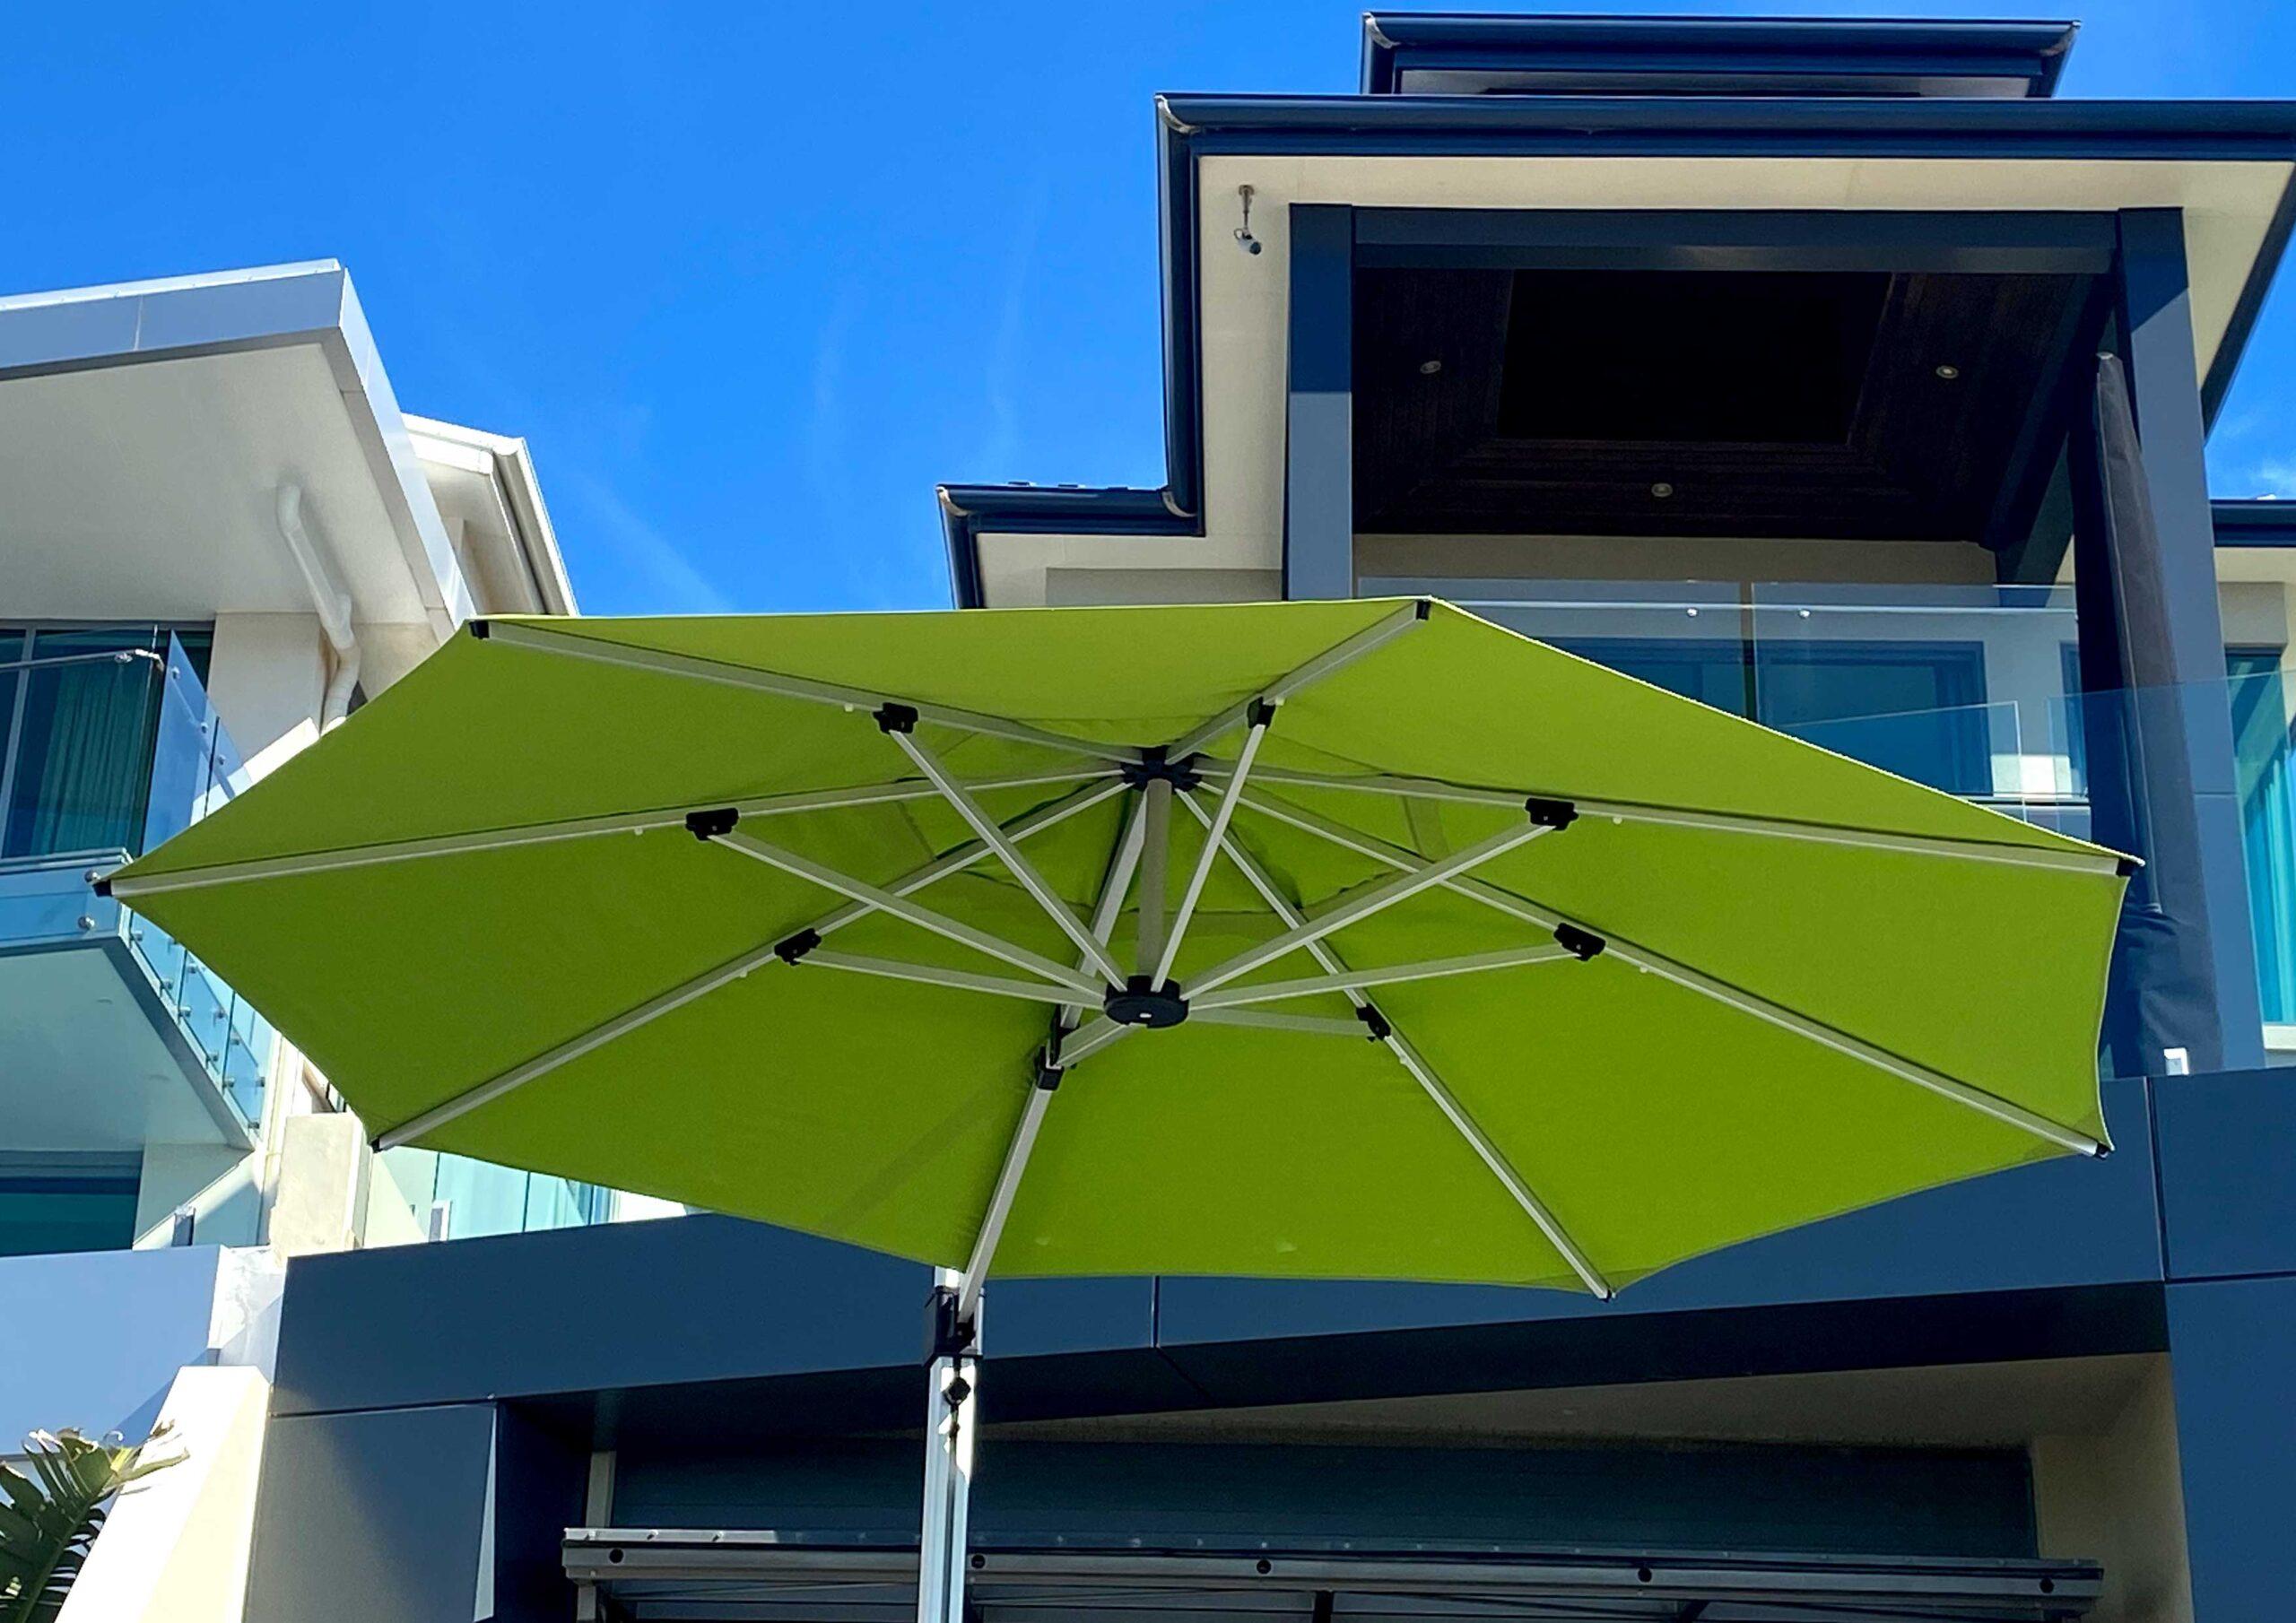 fs gallery images cantilever round octogon umbrella 9